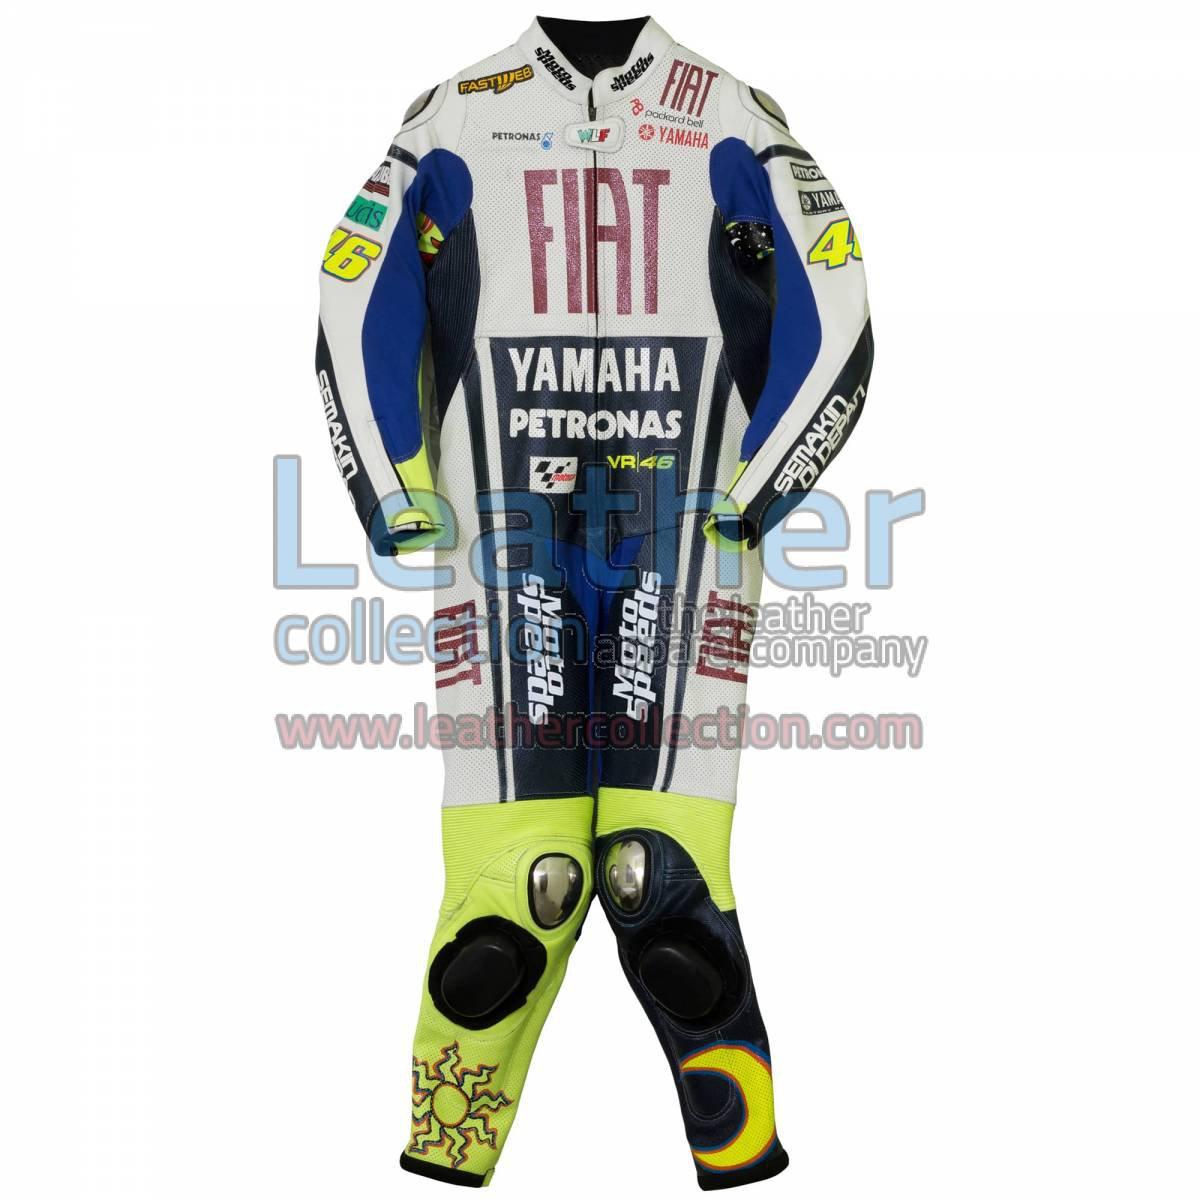 Valentino Rossi Yamaha Fiat MotoGP 2010 Race Suit